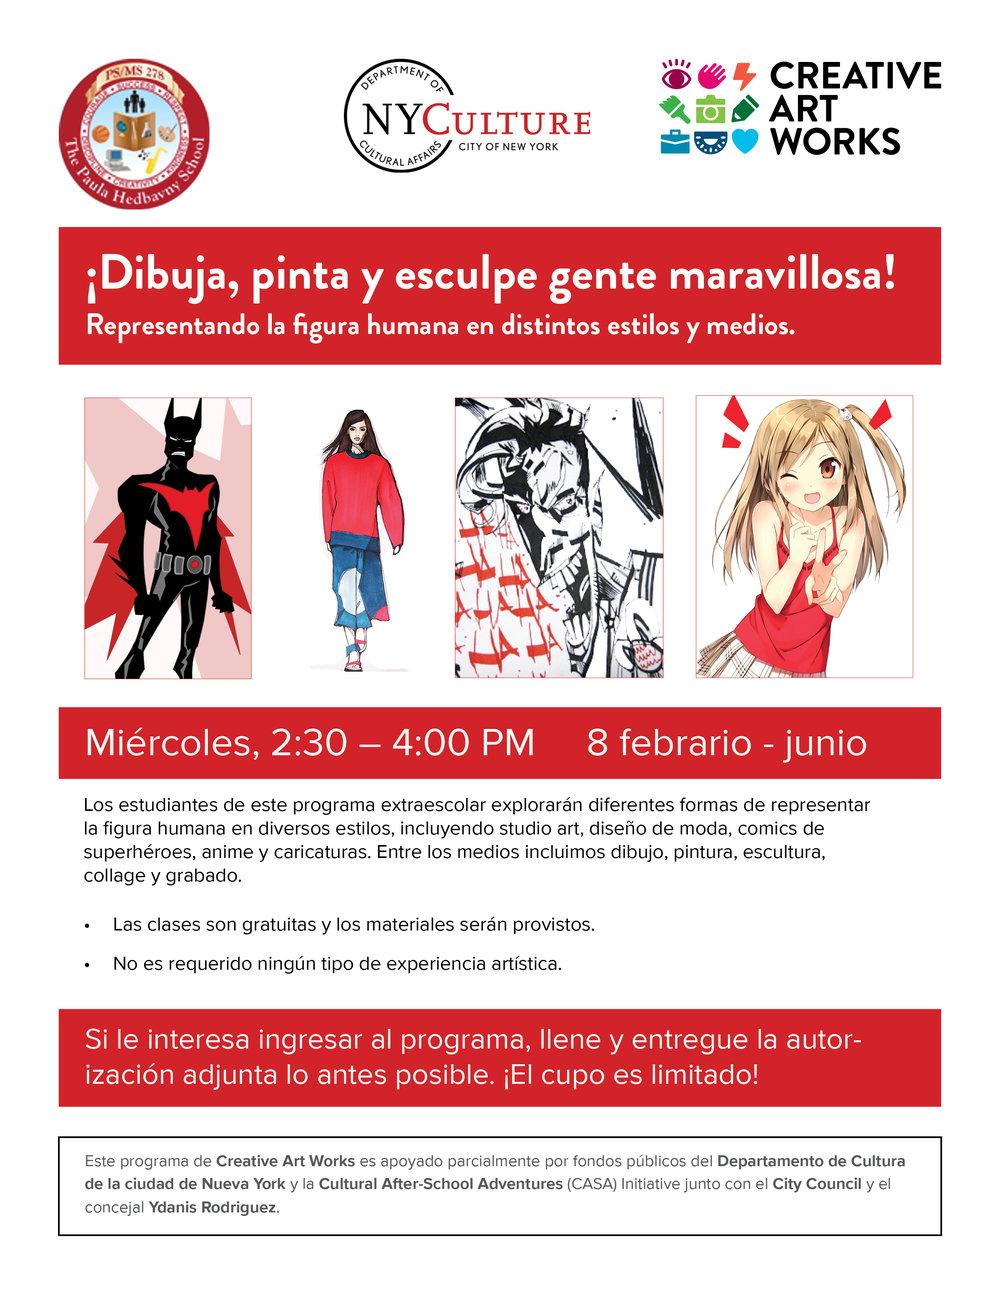 Recruitment Flyer, Spanish Language